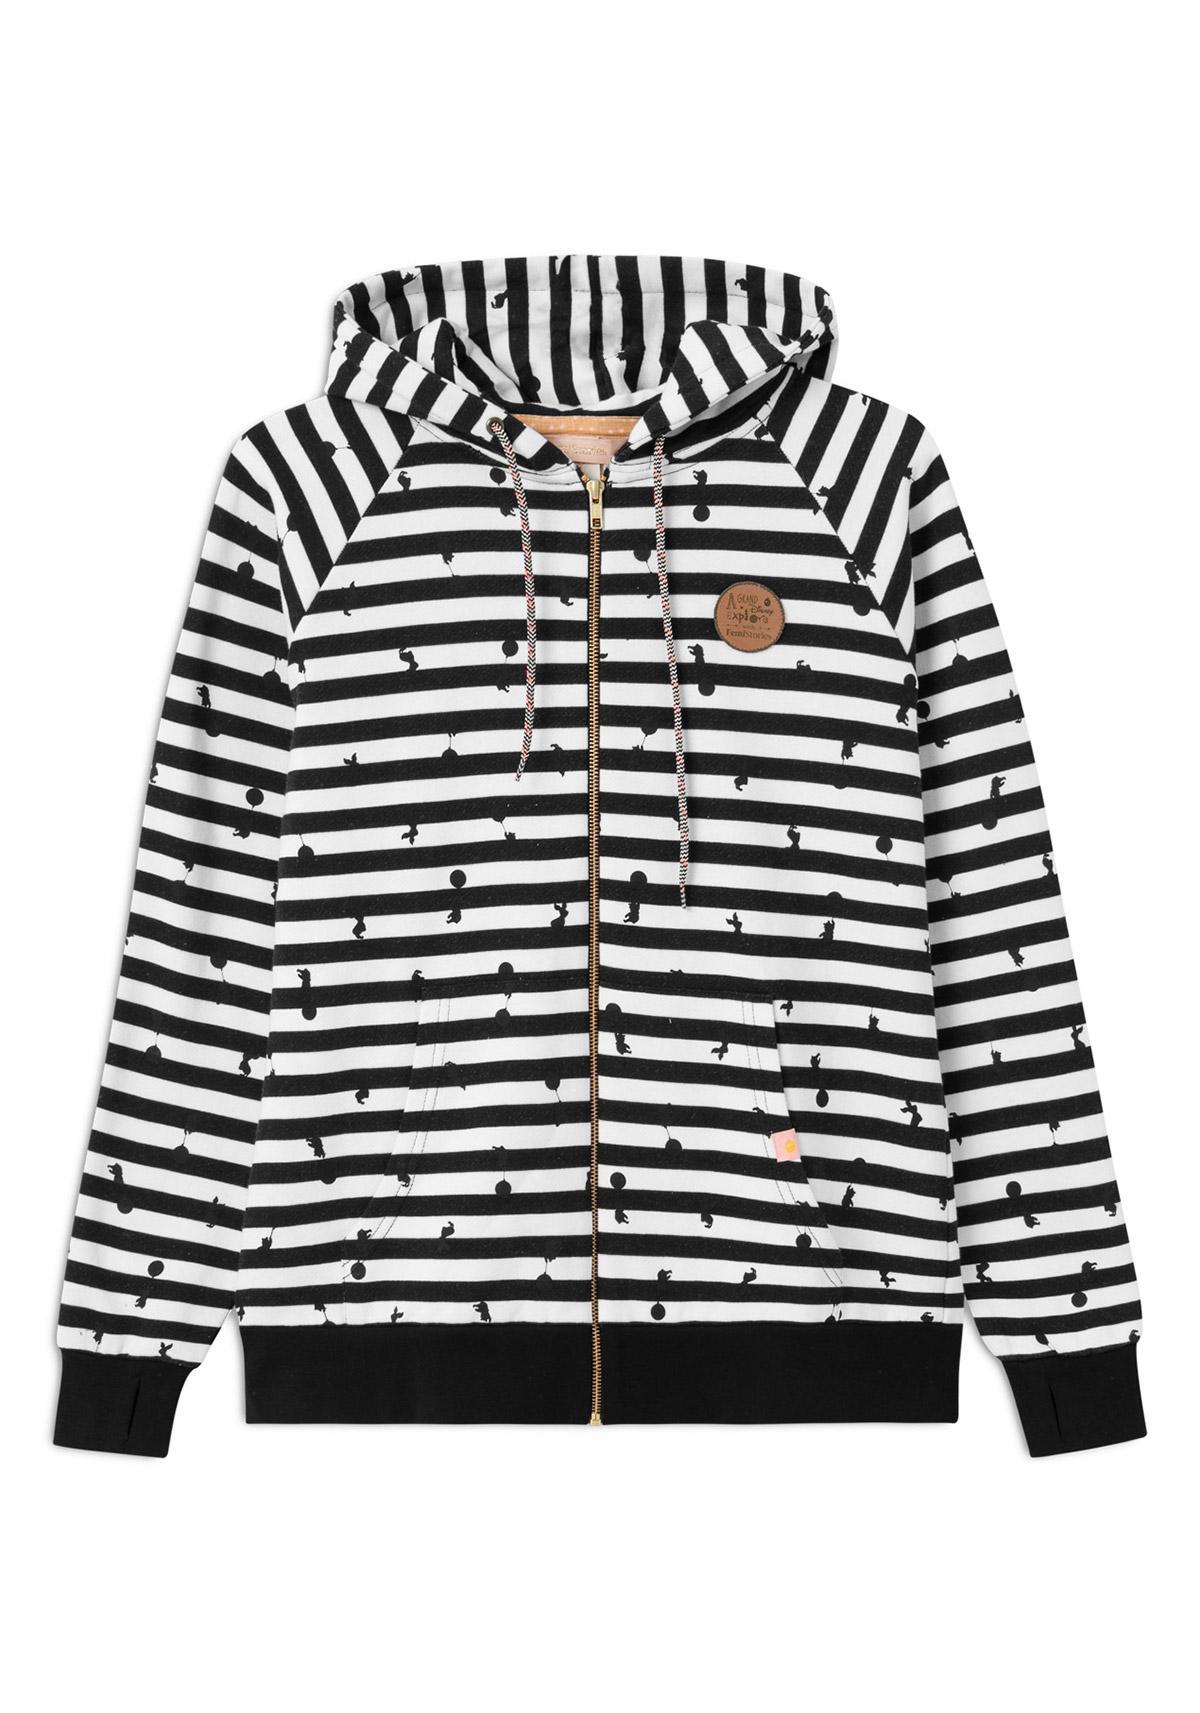 w) Zip Hooded FemiStories x Disney Zebra